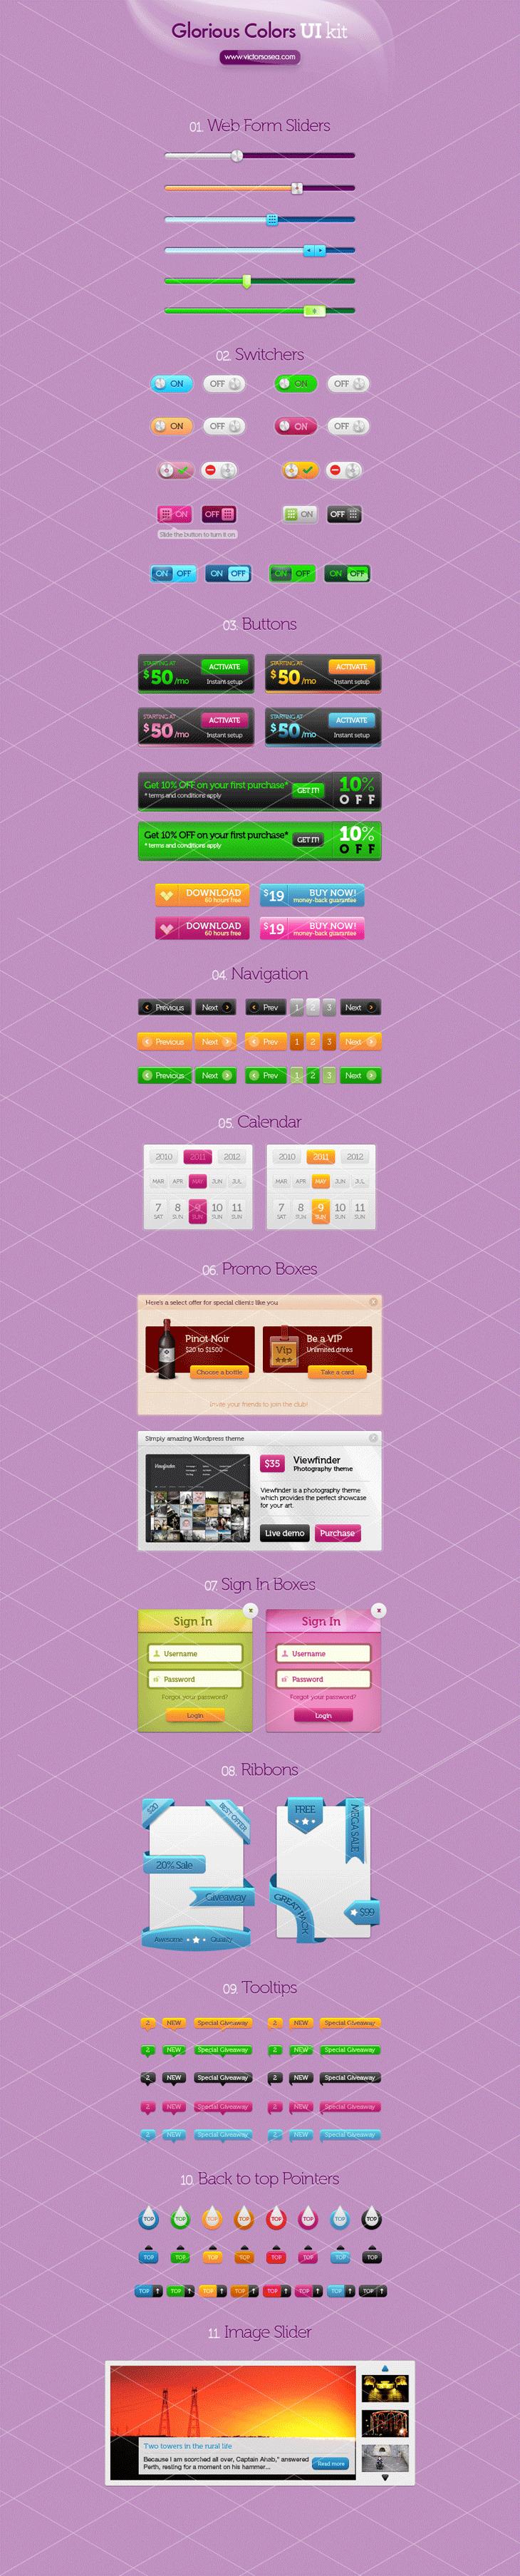 Glorious Colors UI Kit